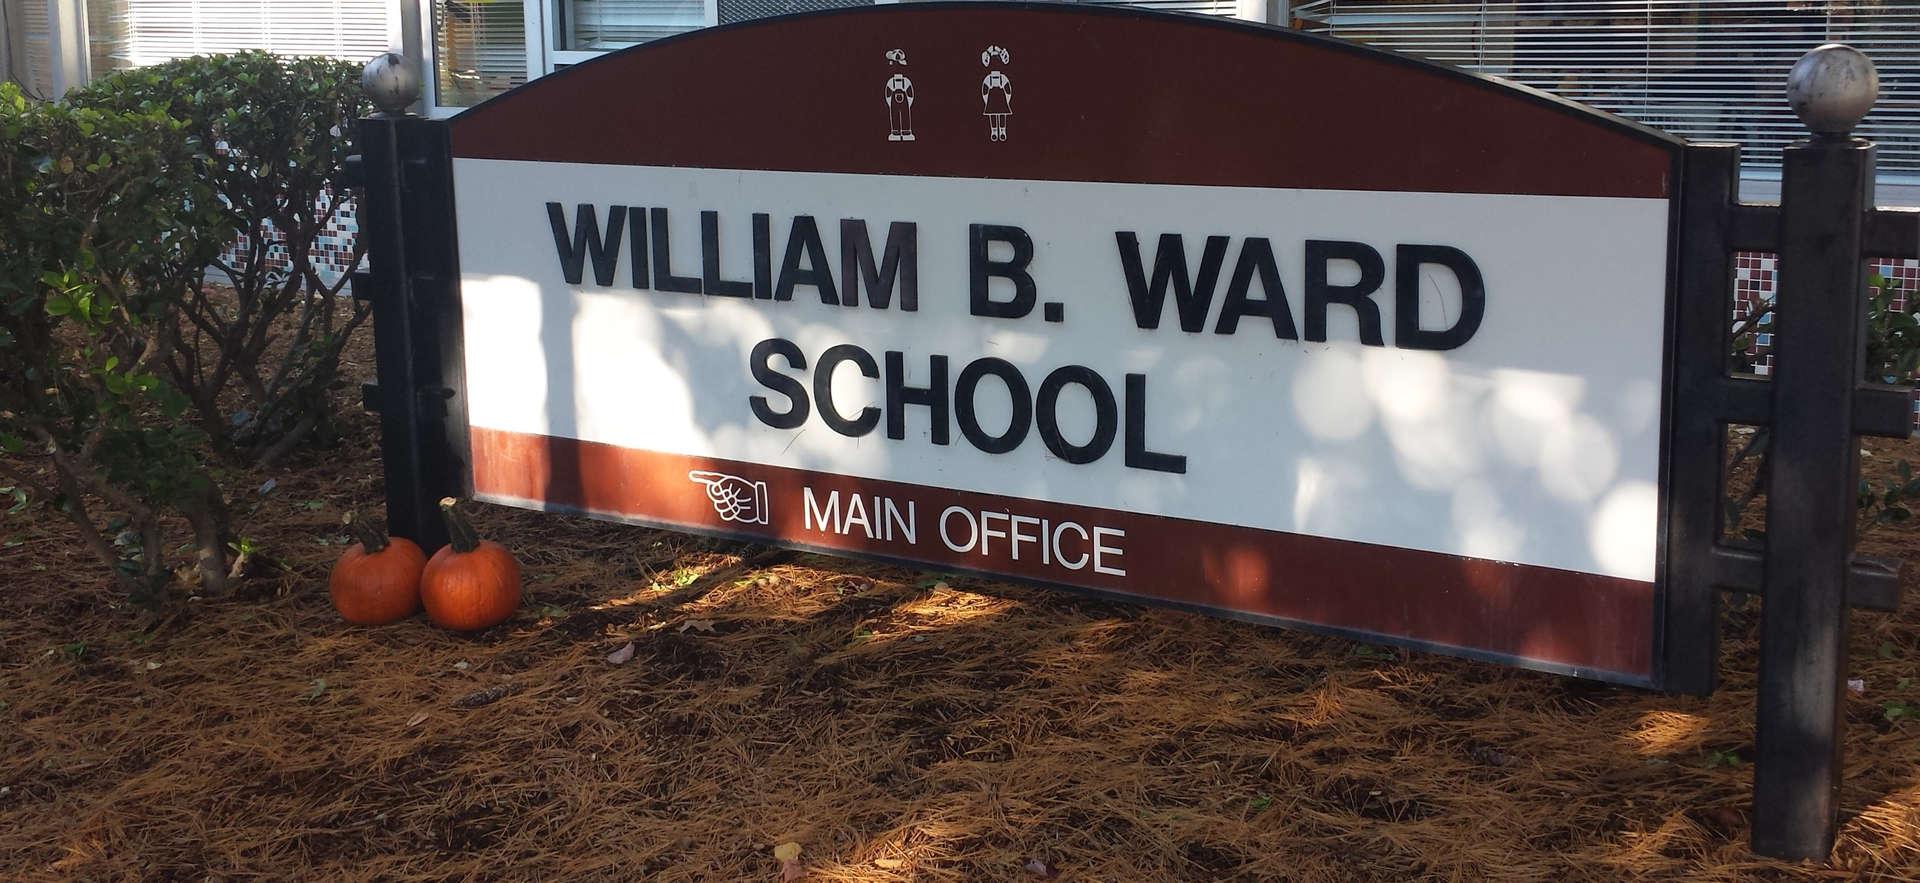 Ward School Welcome Sign